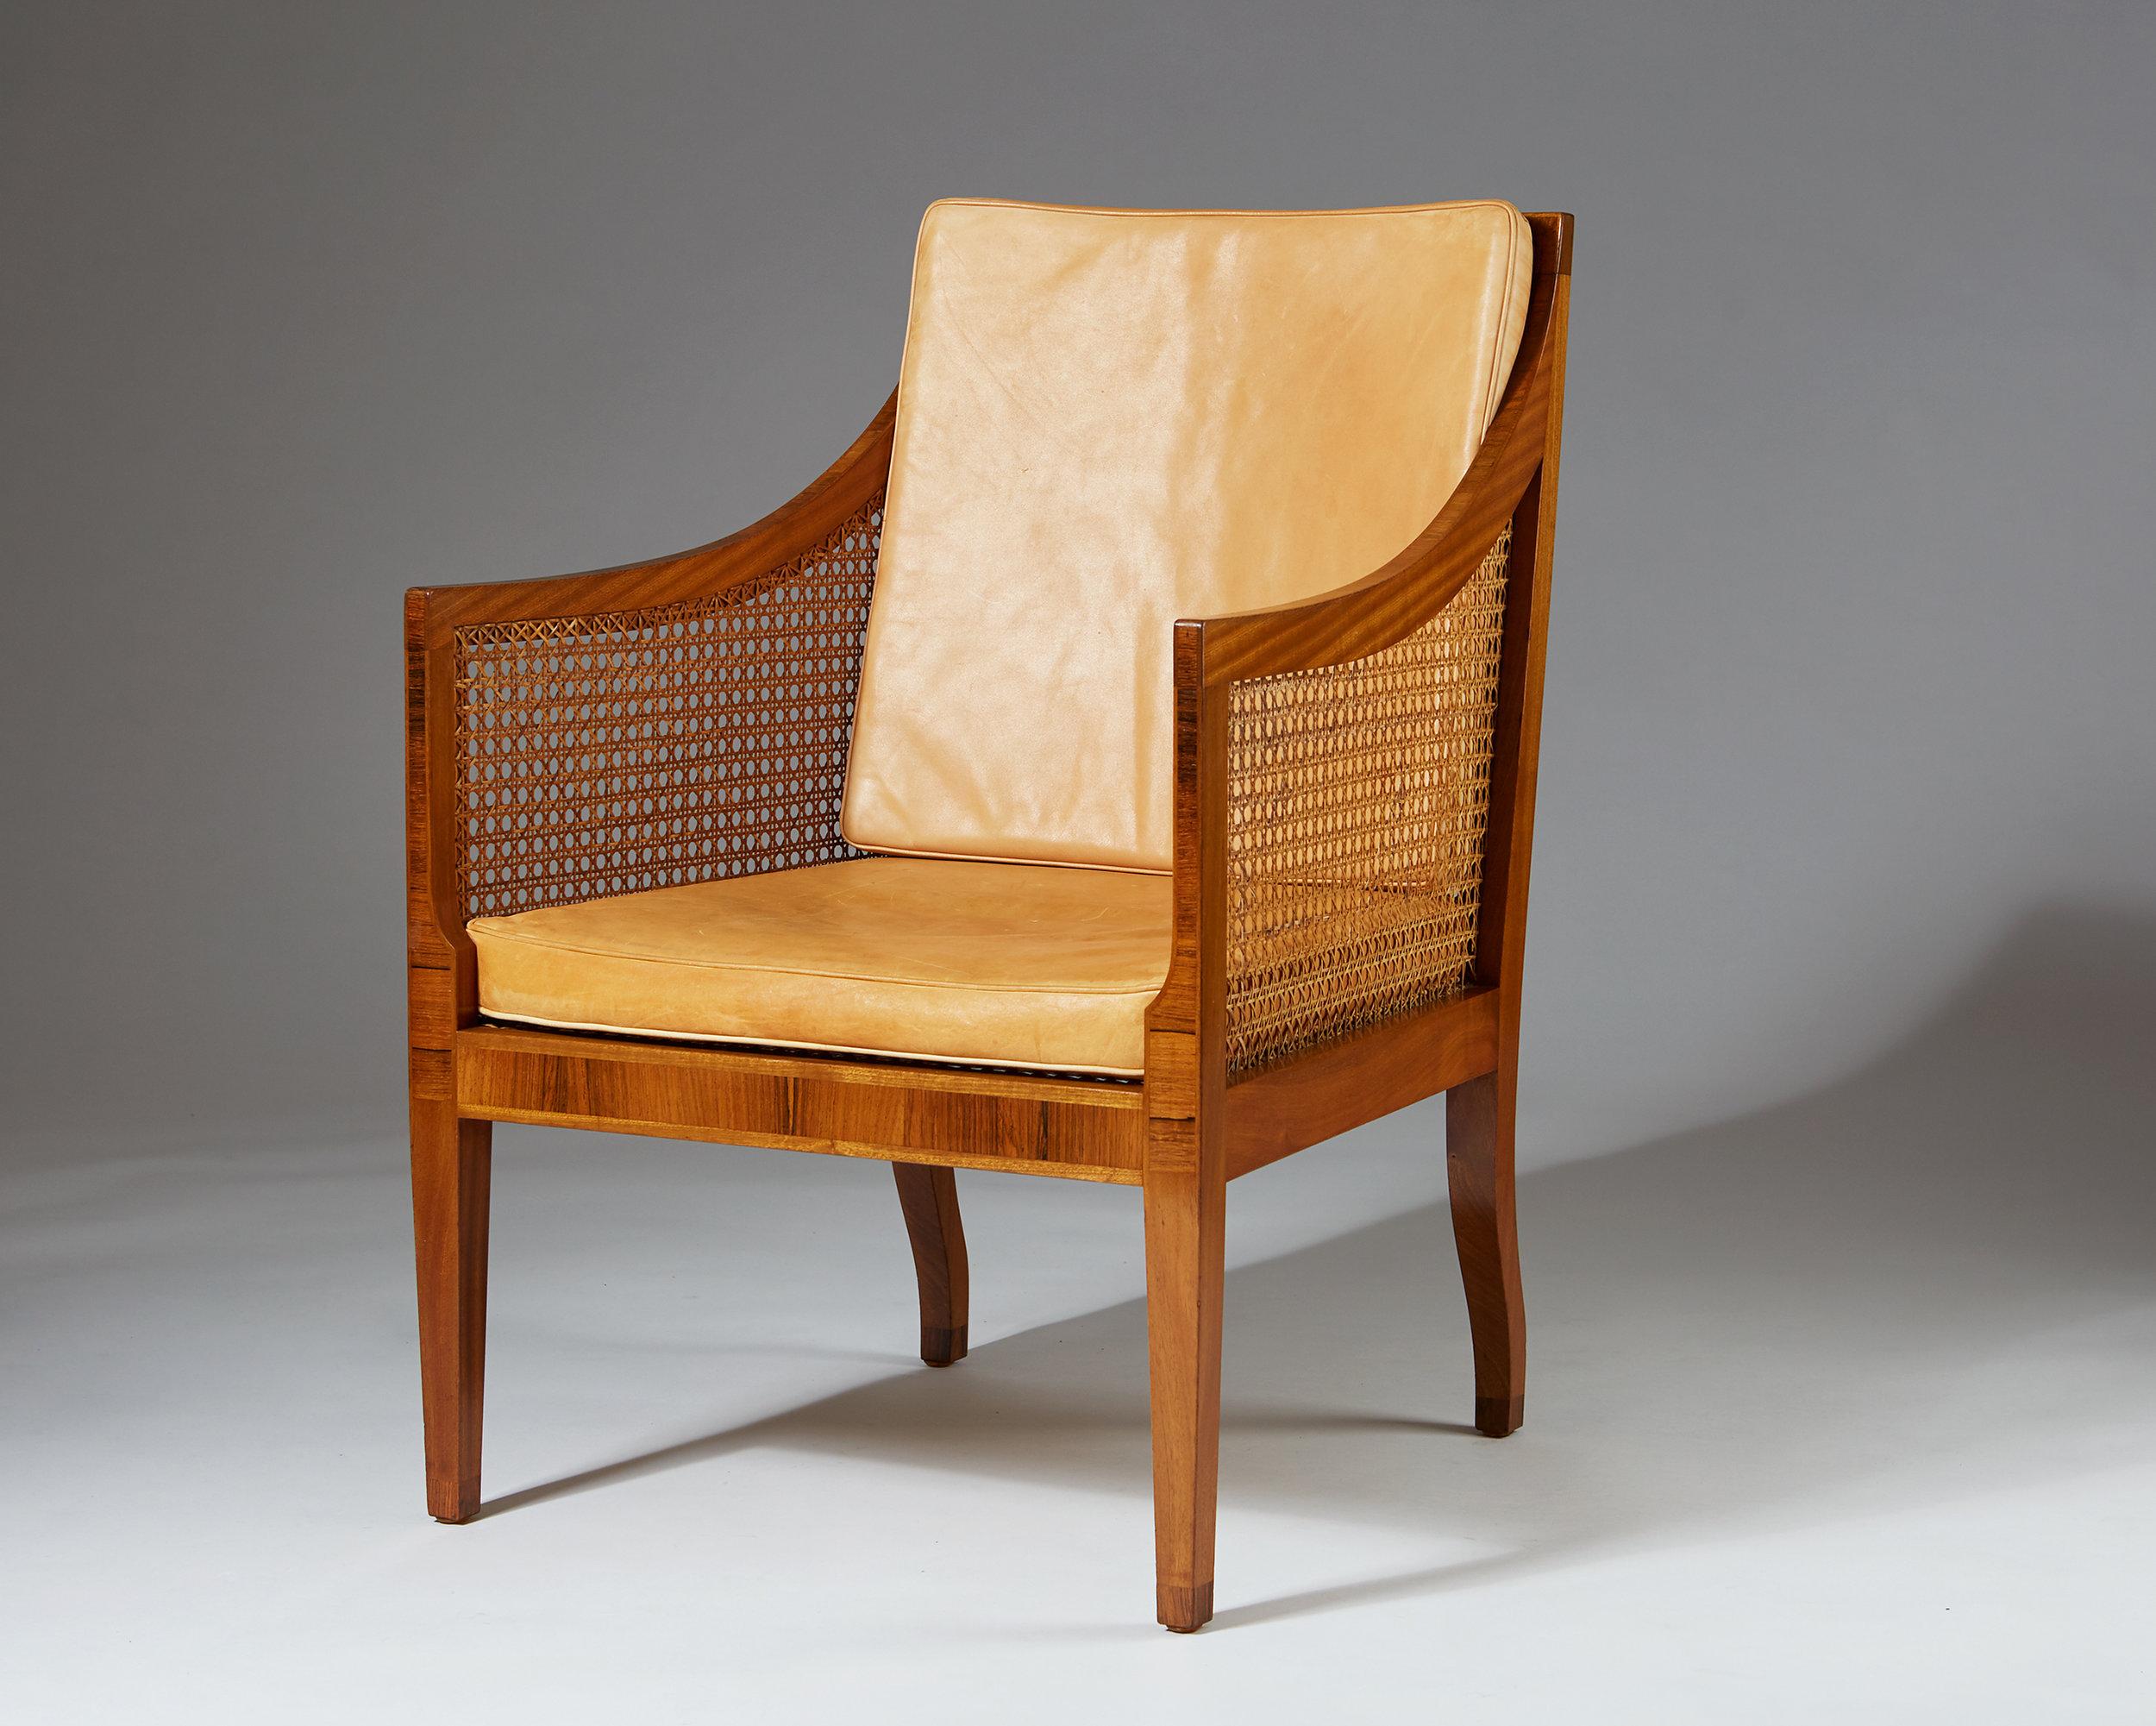 Kaare Klint  Armchair model 4488 Denmark, 1931 Mahogany with Brazilian rosewood inlays, woven cane and aniline leather. 90,5 x 75 x 61,5 cm Seat: 43 cm Armrest: 65 cm